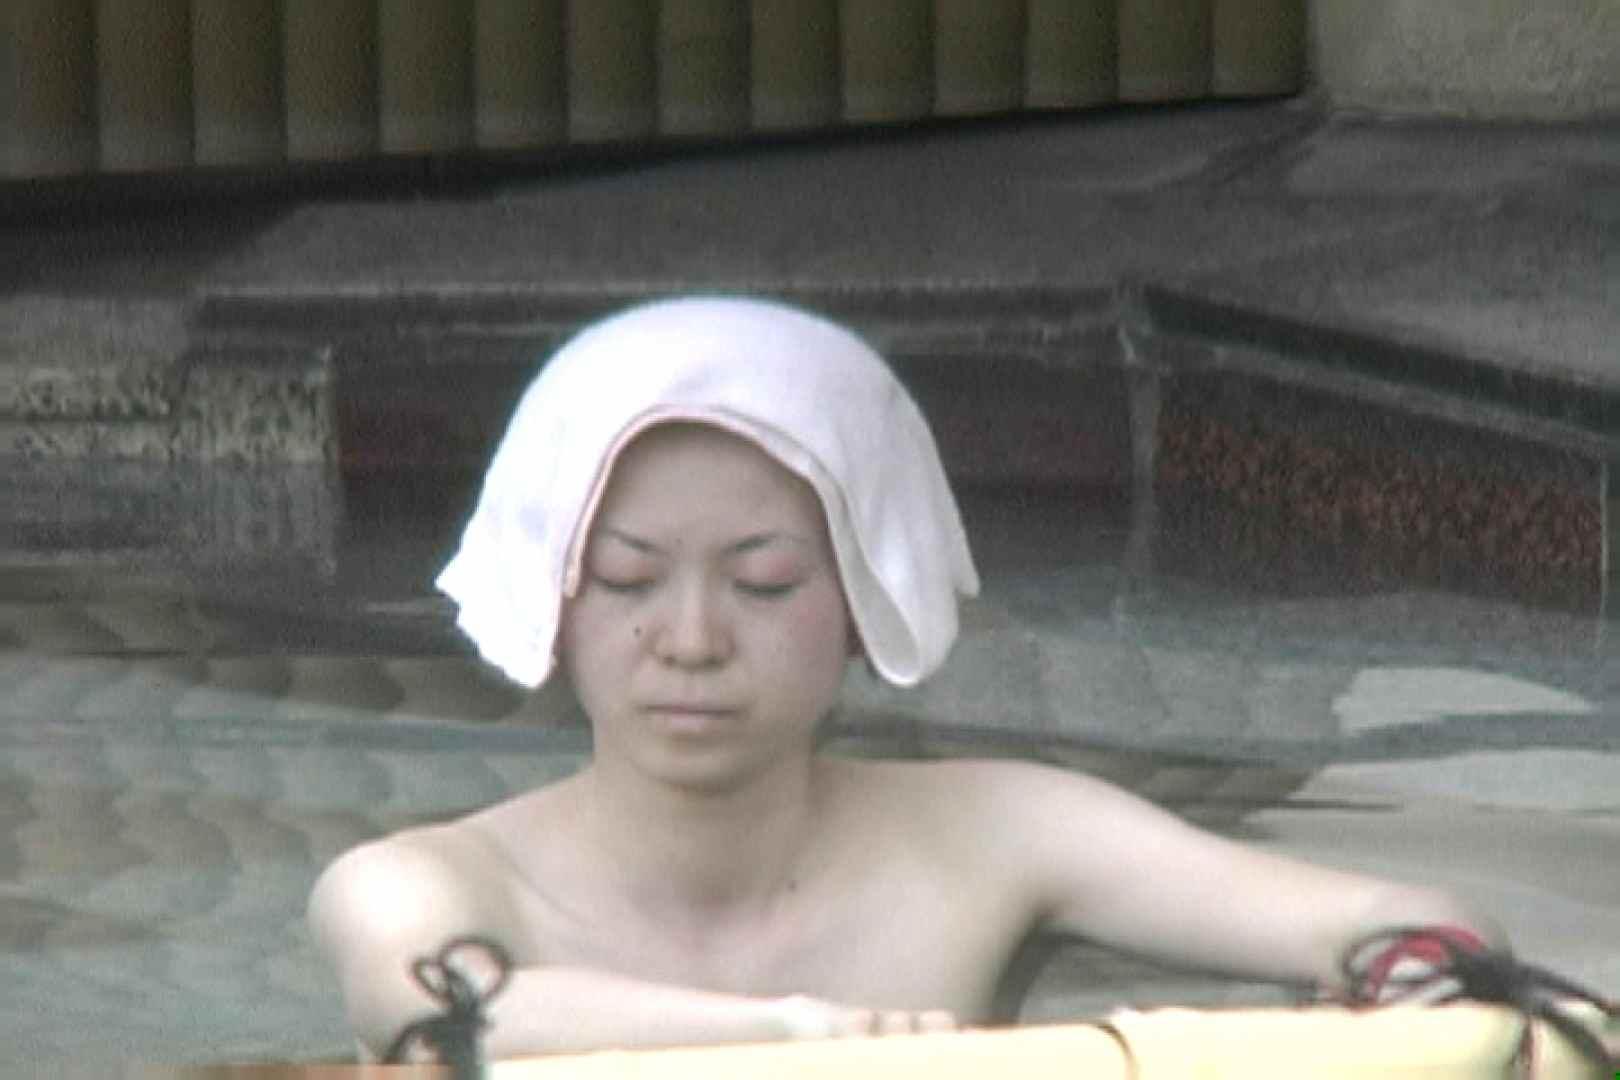 Aquaな露天風呂Vol.693 露天風呂編  105PIX 24